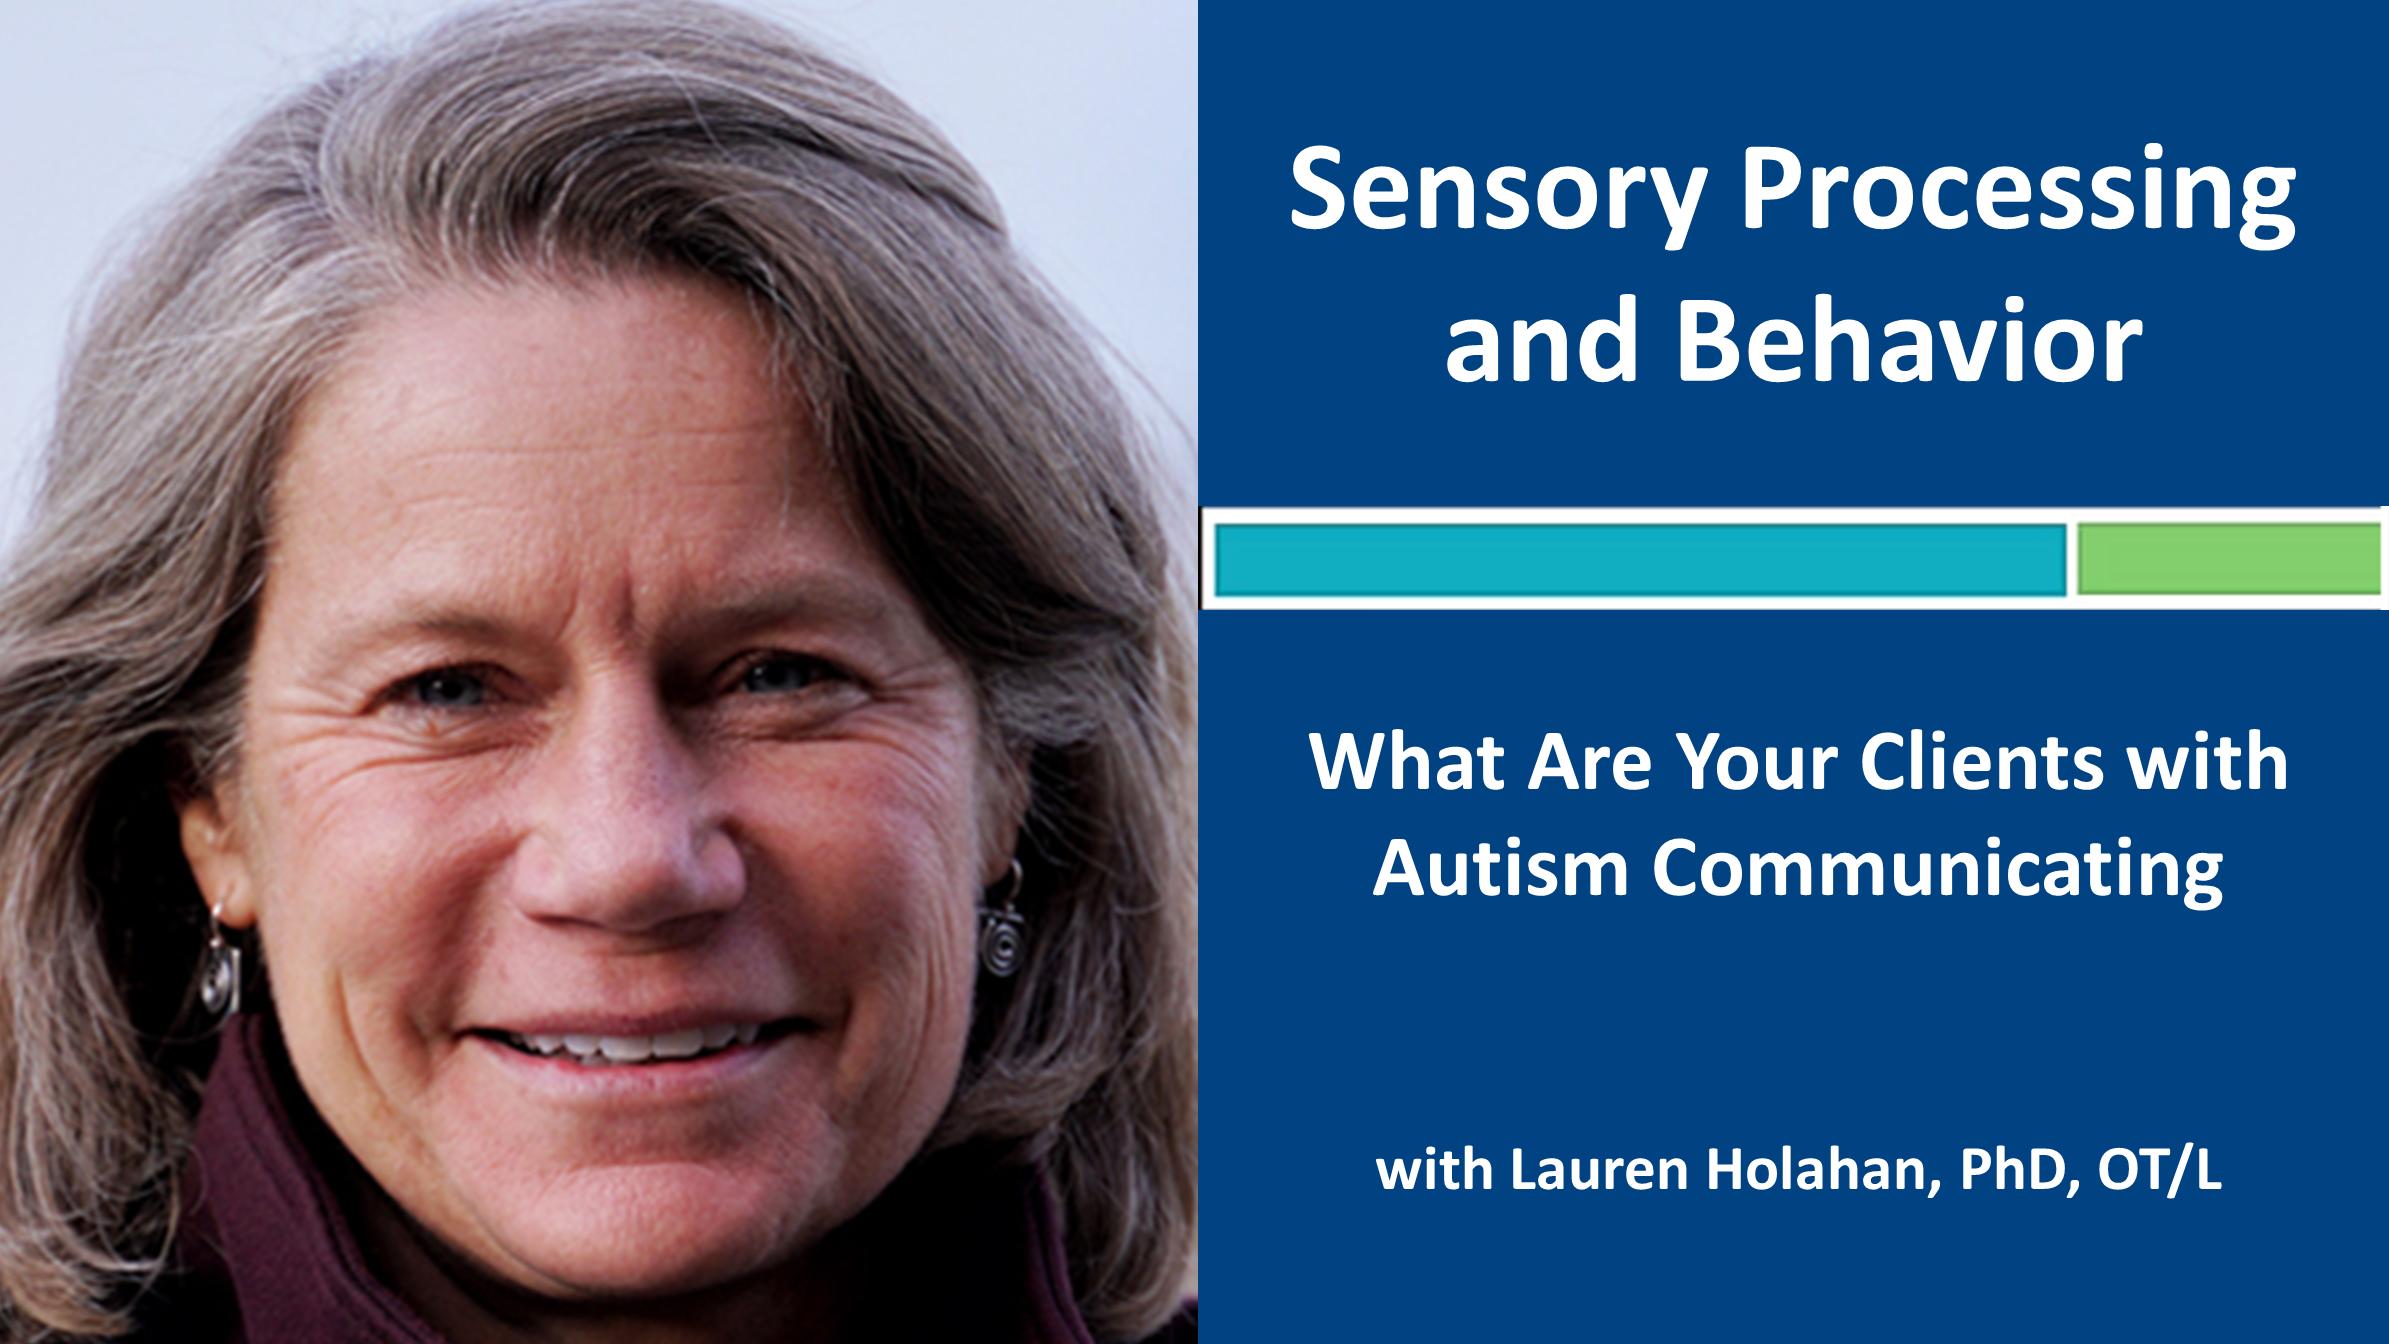 Webinar 4: Sensory Processing and Behavior: Autism with Lauren Holahan, PhD, OT/L